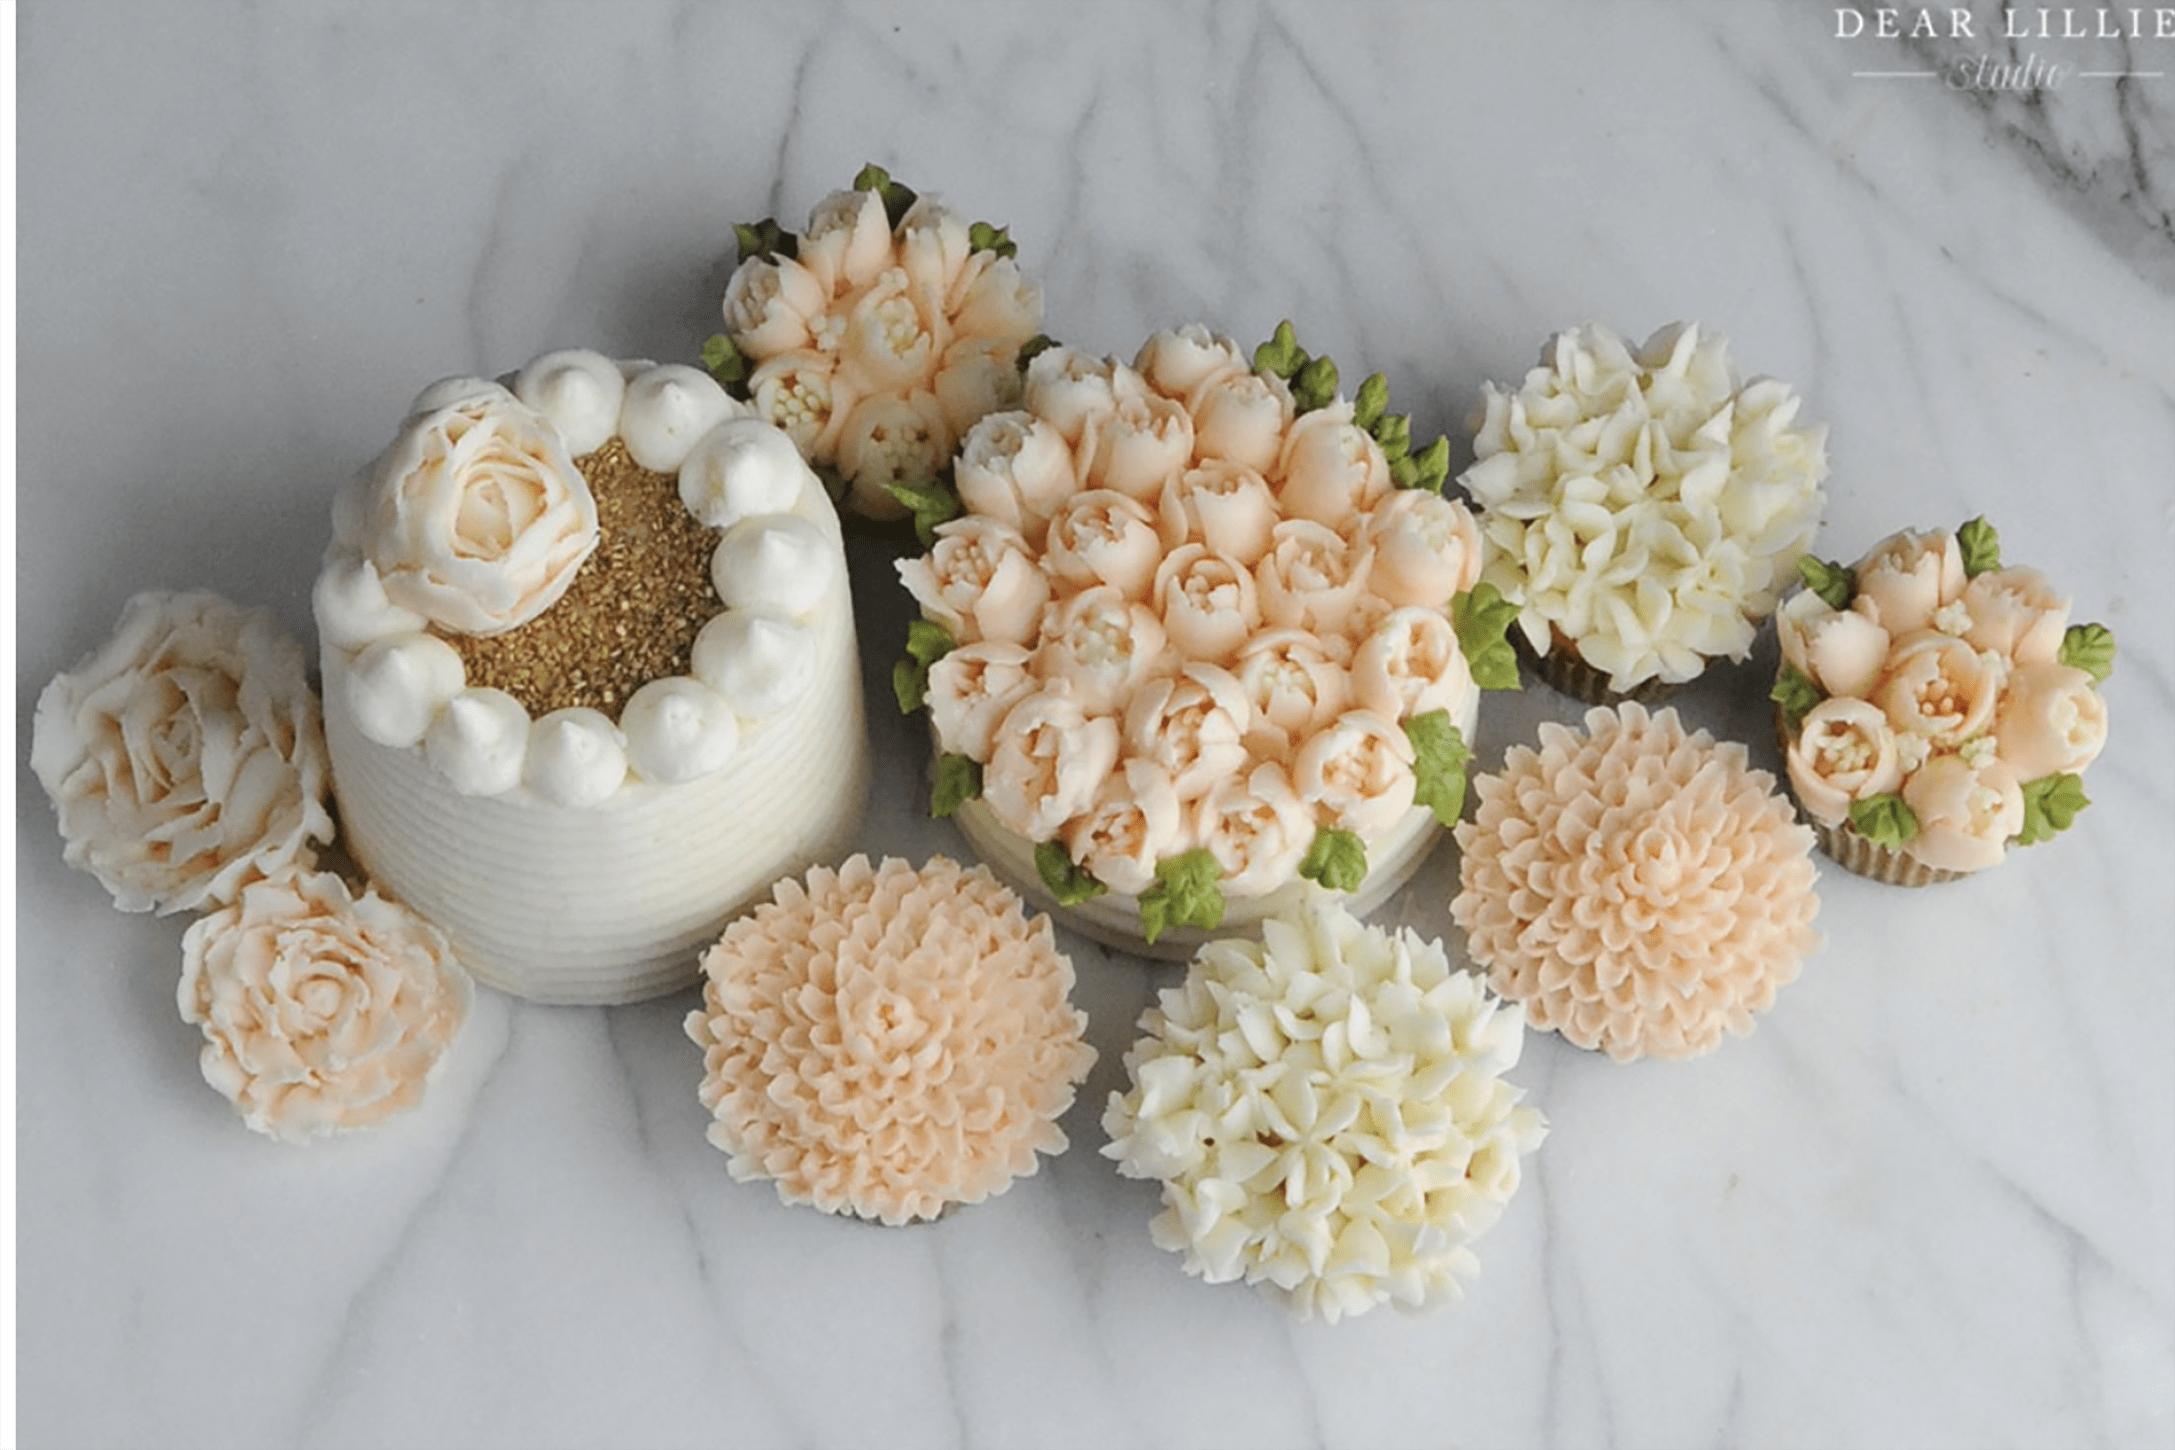 dear lillie tulip cupcakes on cindy hattersley's blog